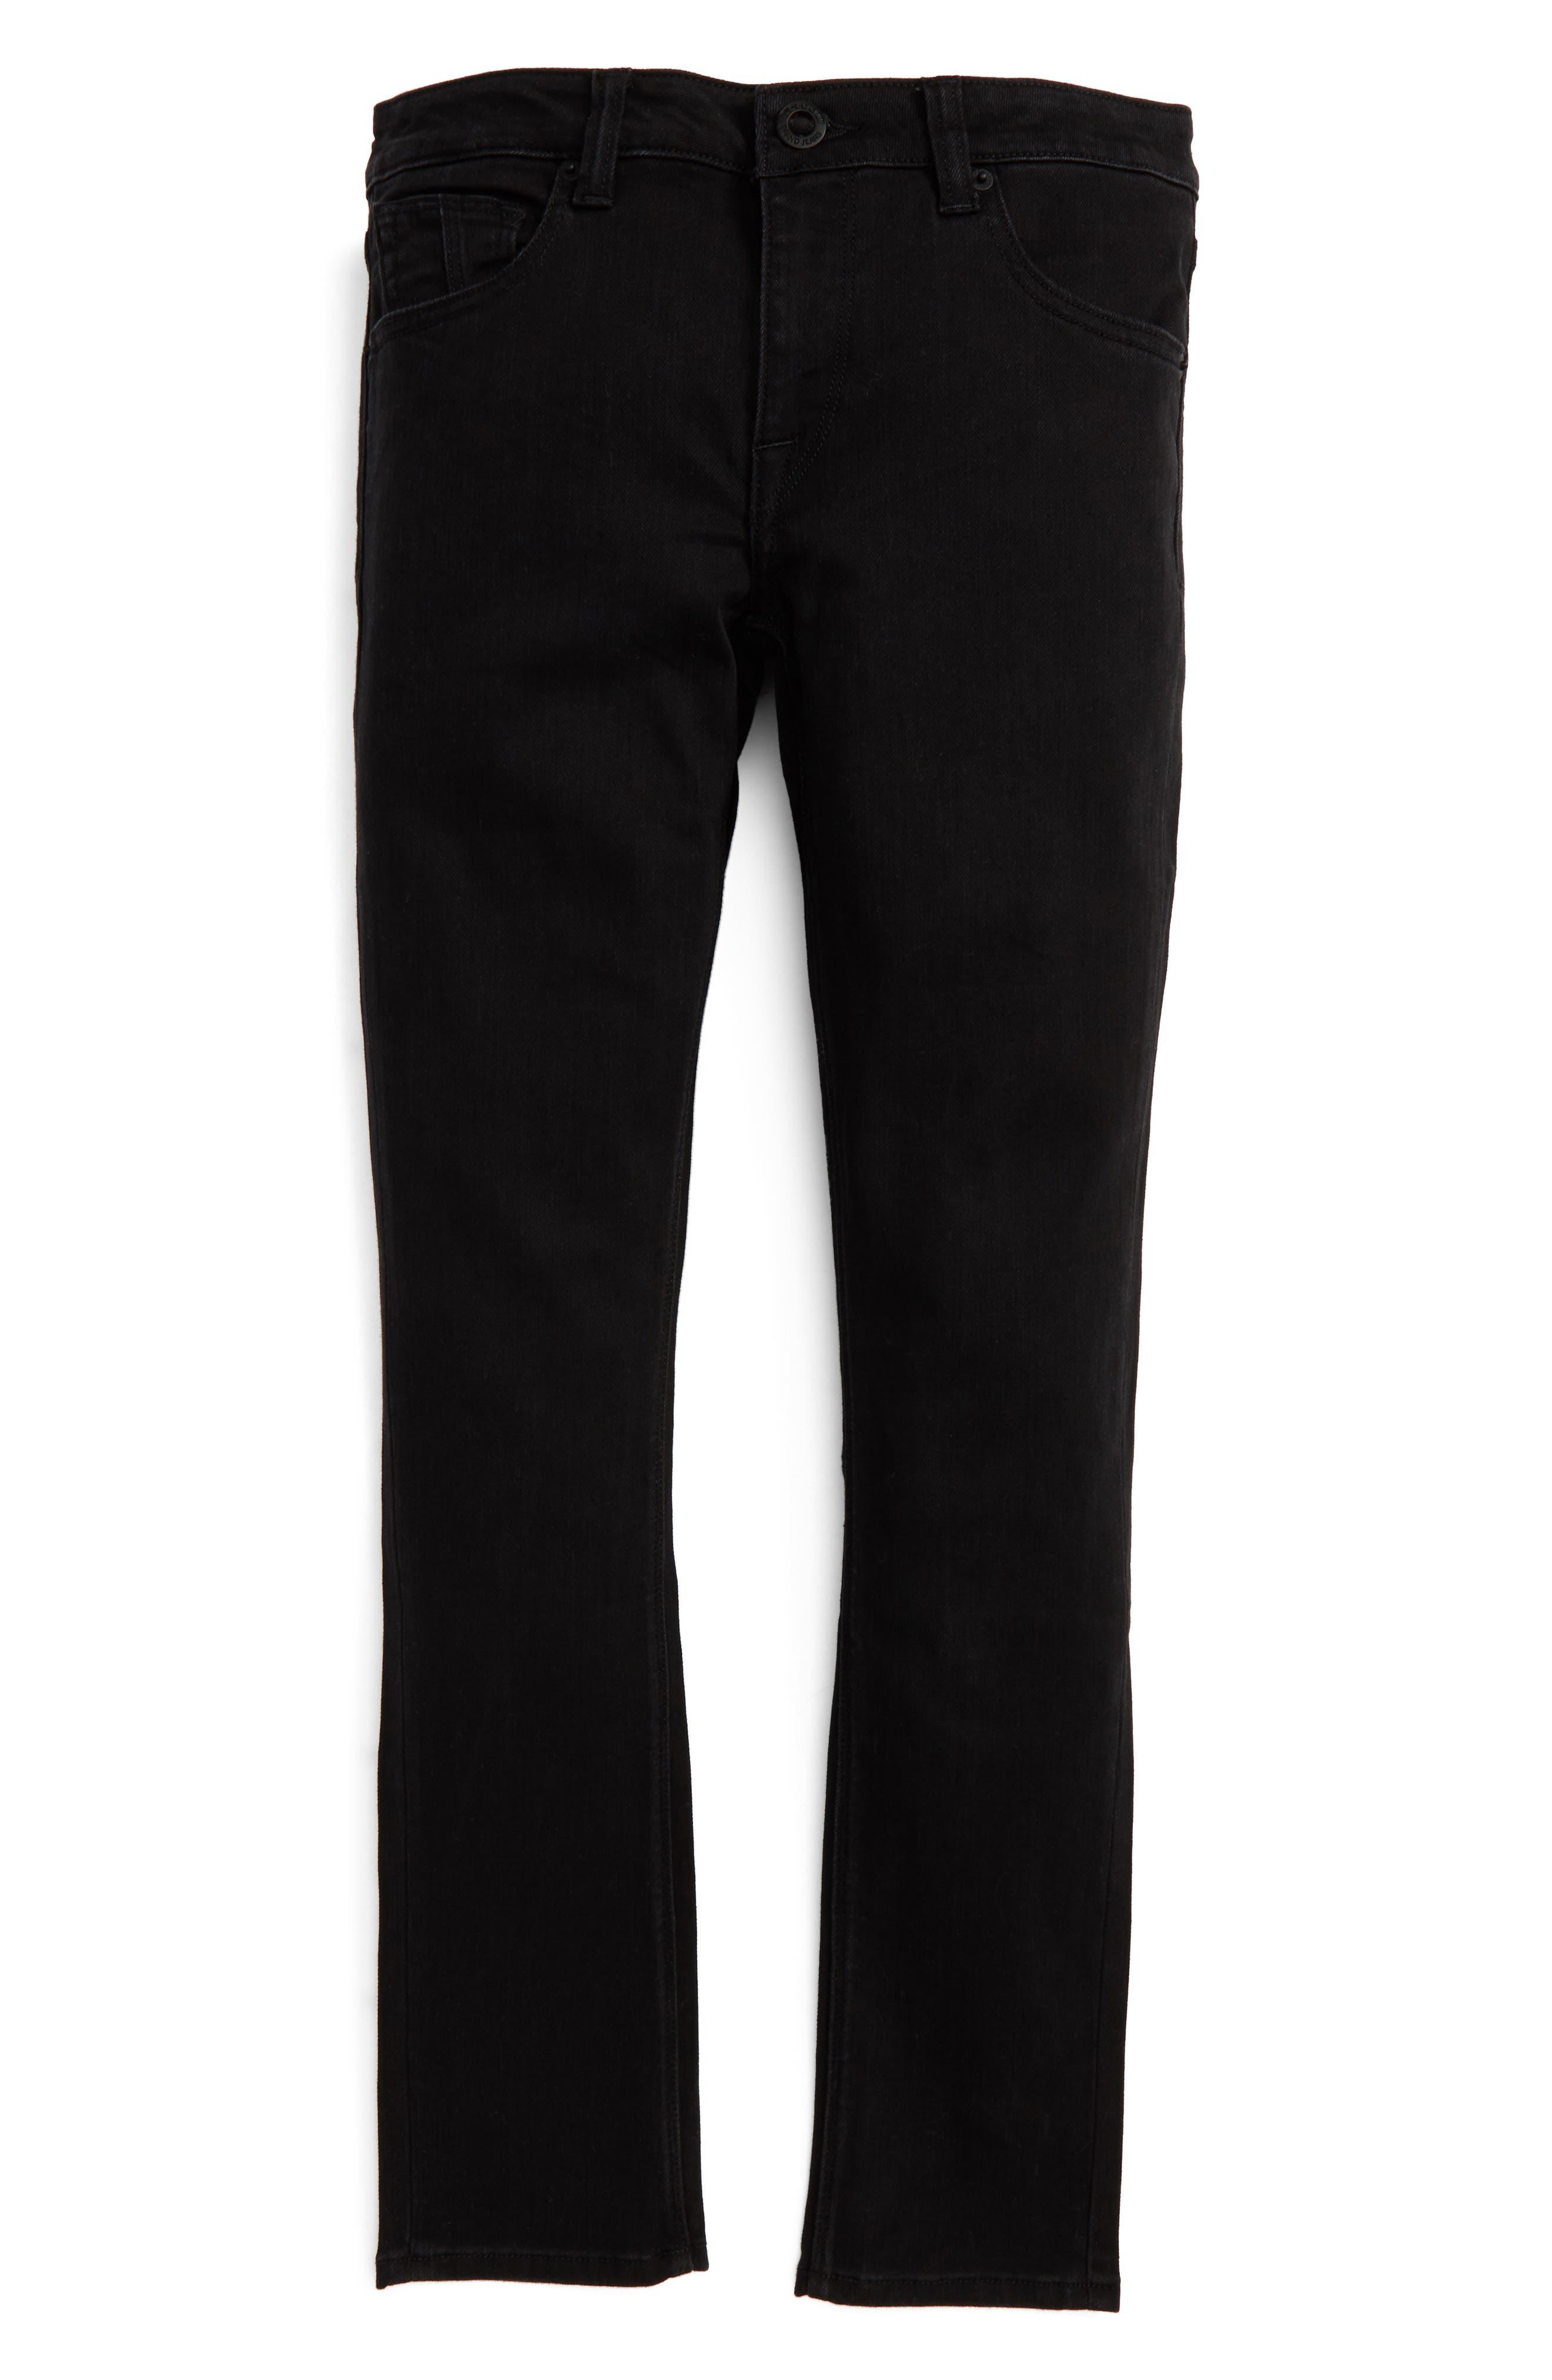 'Solver' Straight Leg Denim Jeans,                         Main,                         color, 004